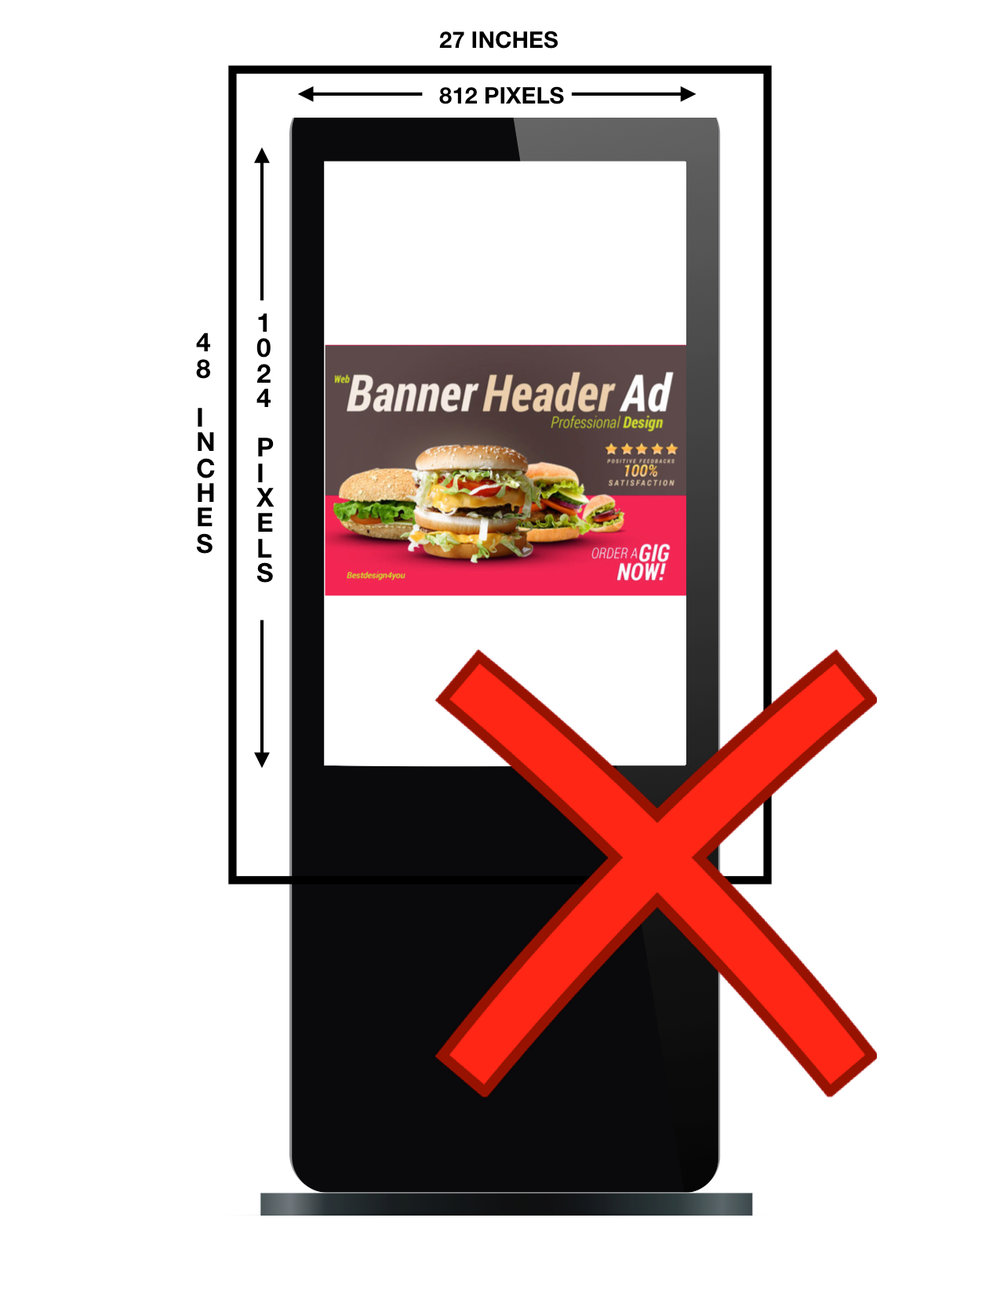 lcd kiosk pixels wrong layout.jpeg